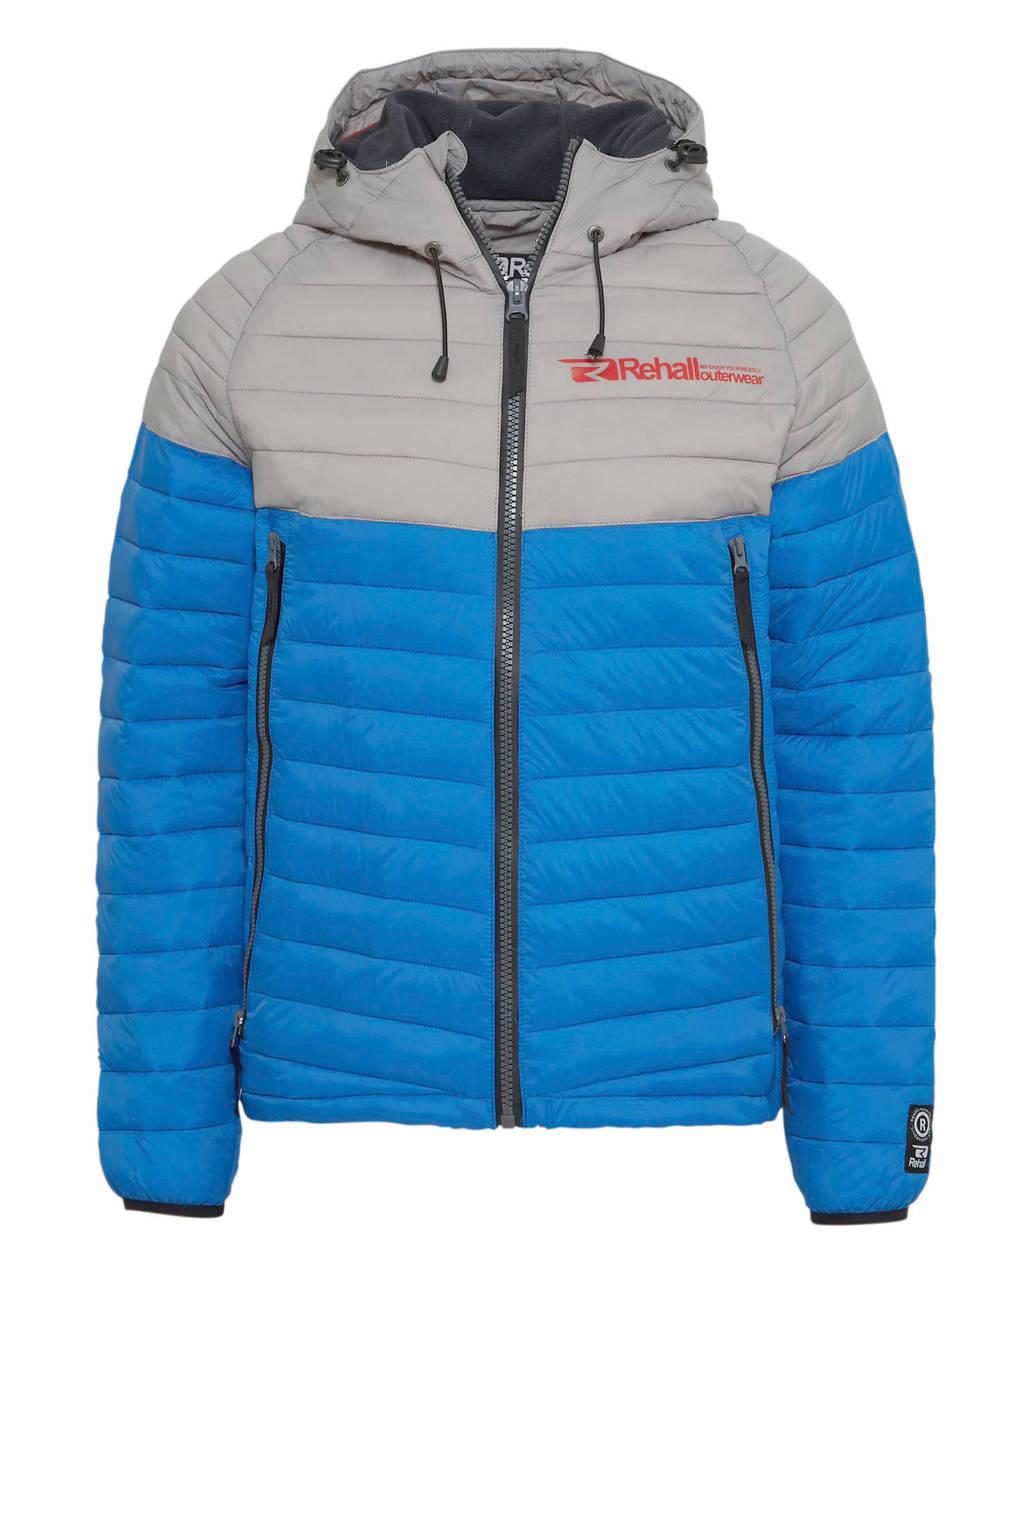 Rehall gewatteerde jas blauw/lichtgrijs